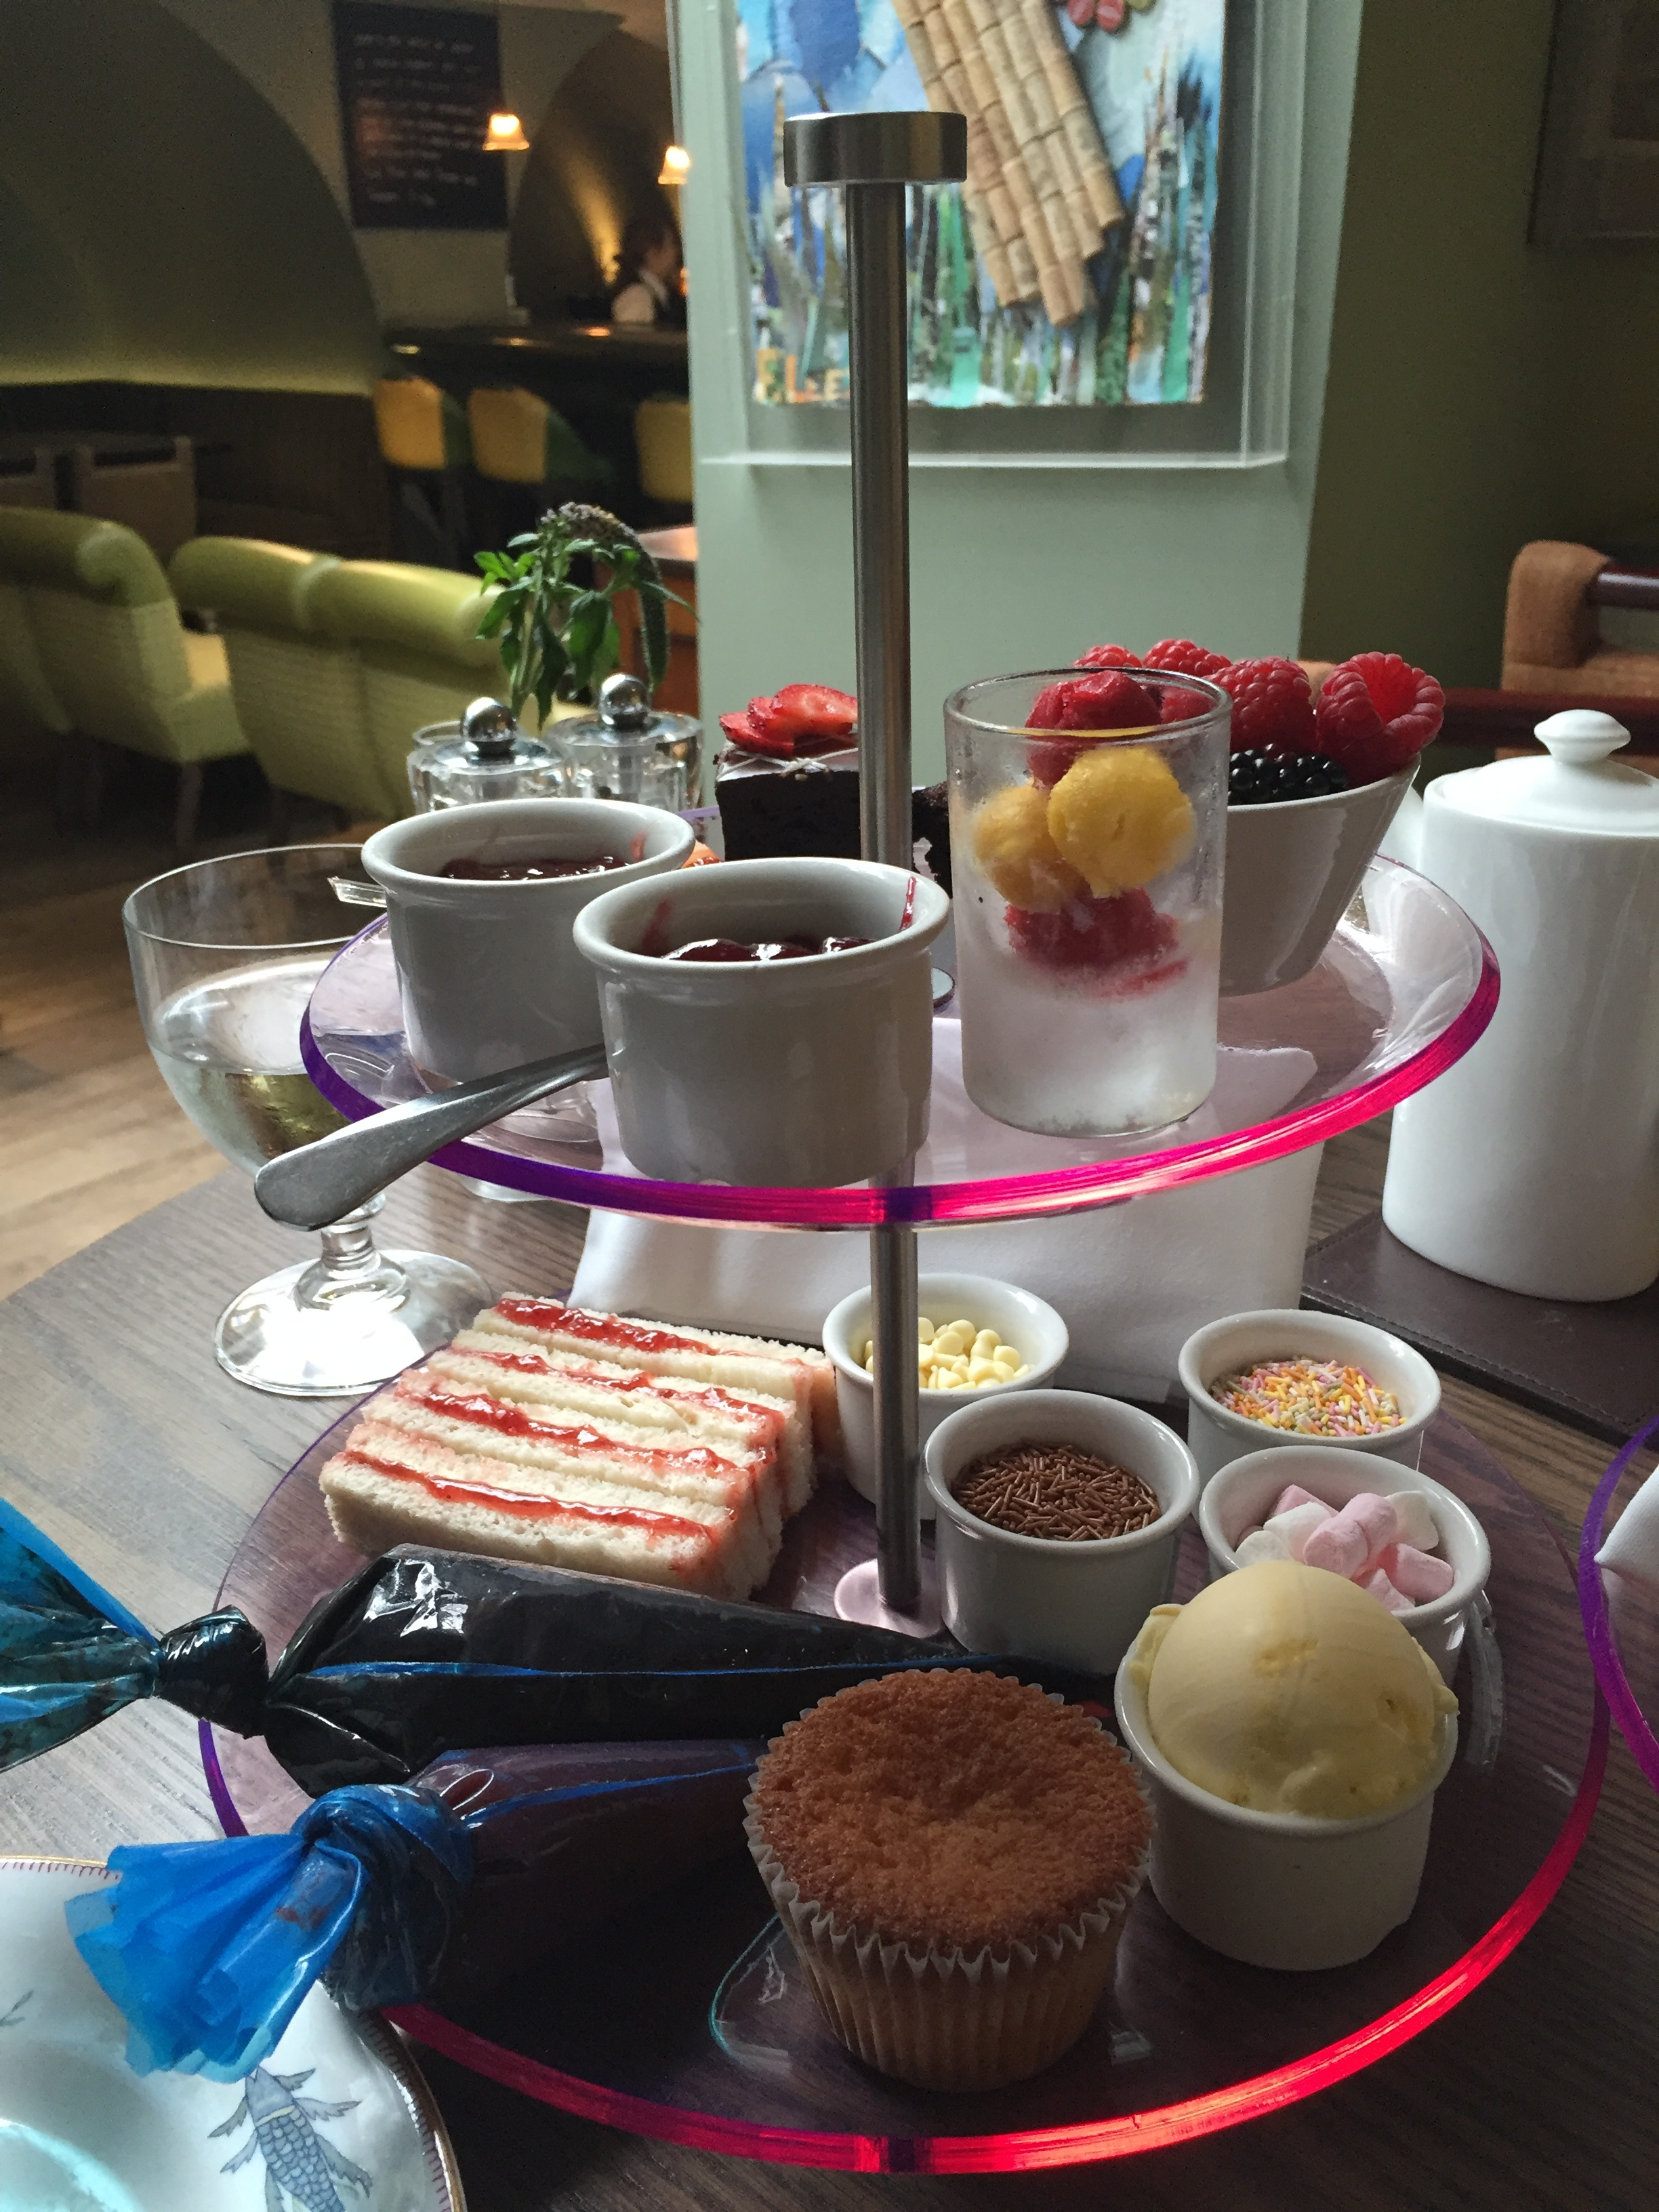 Oscar's DIY afternoon tea